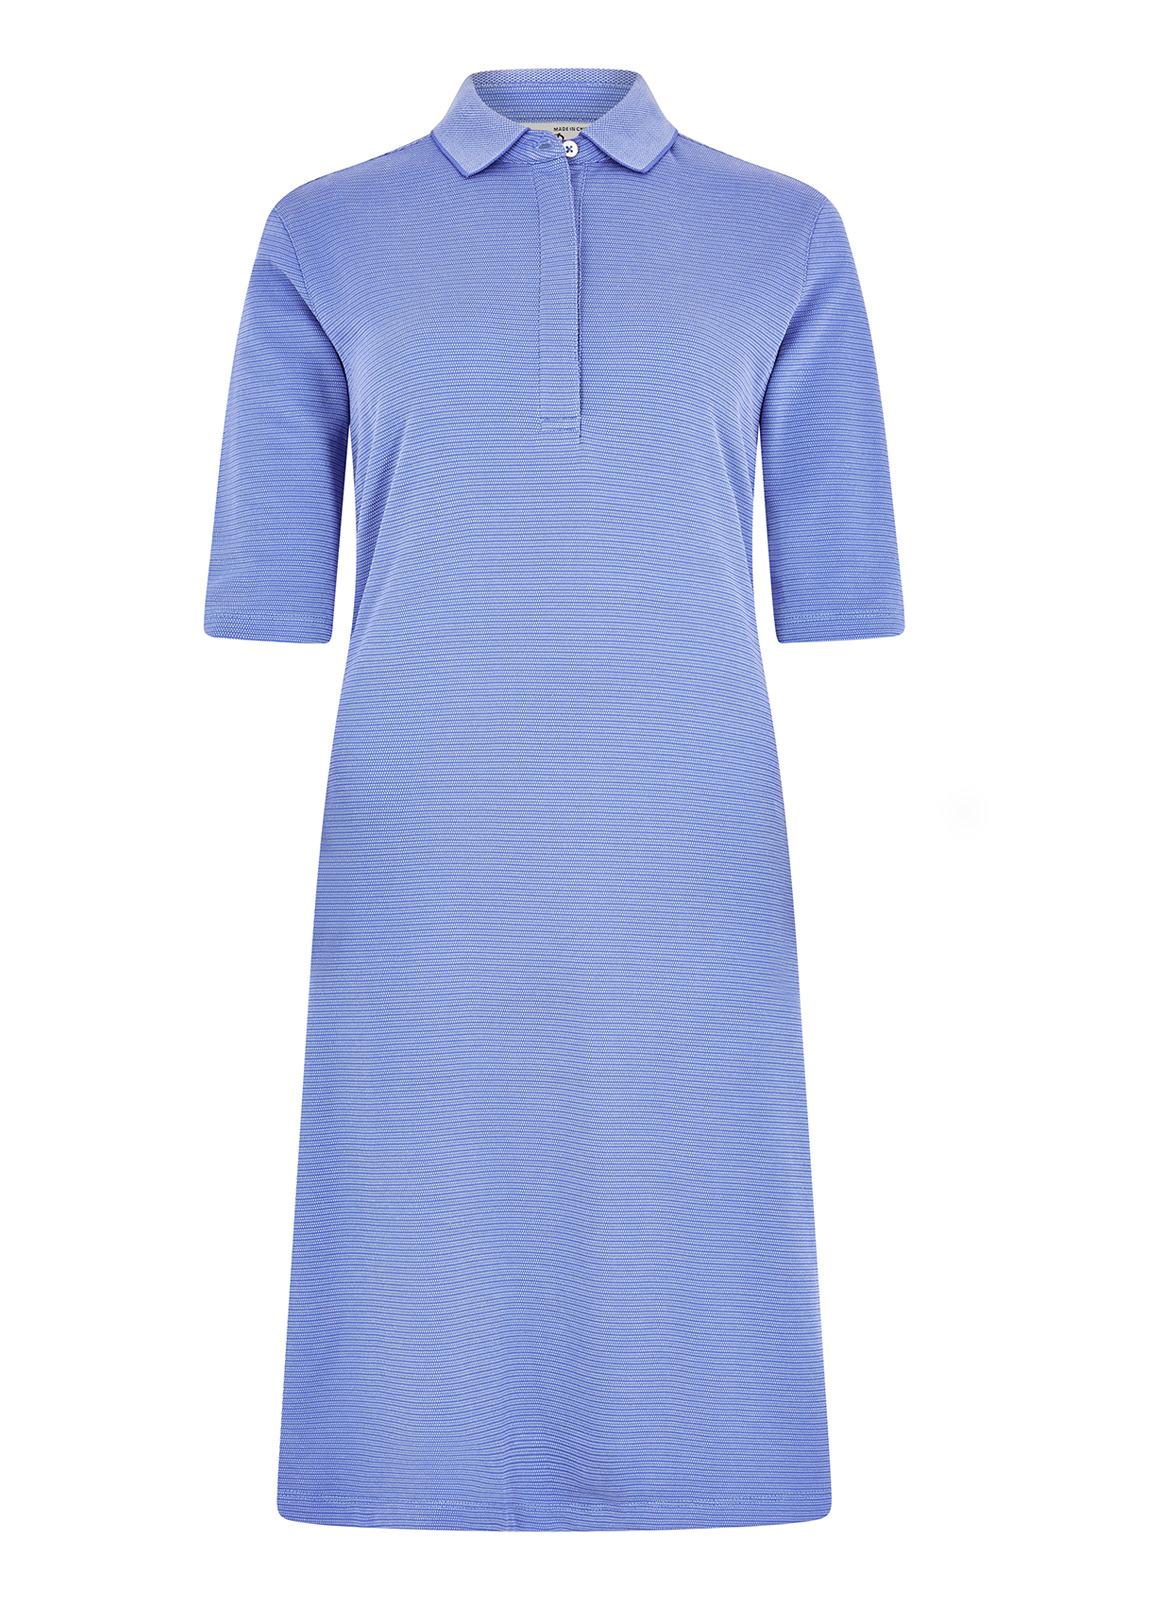 Dubarry_Ardee Dress - Blue_Image_2